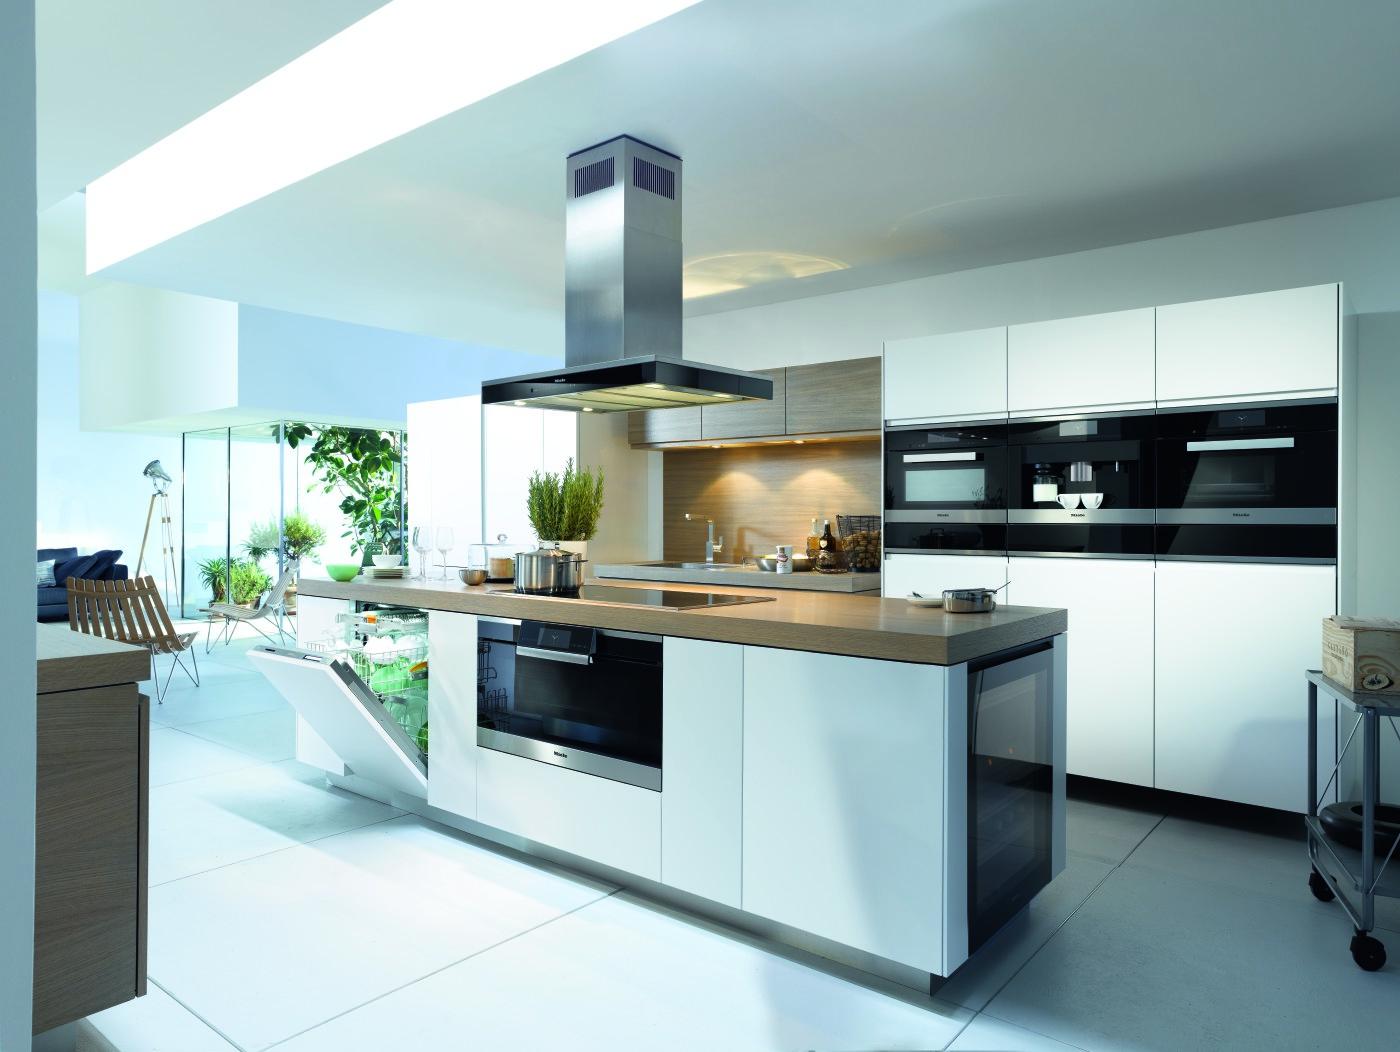 Uncategorized Kitchen Appliances Specialists bade appliance home appliances kitchen in bradley il london store elan kitchens